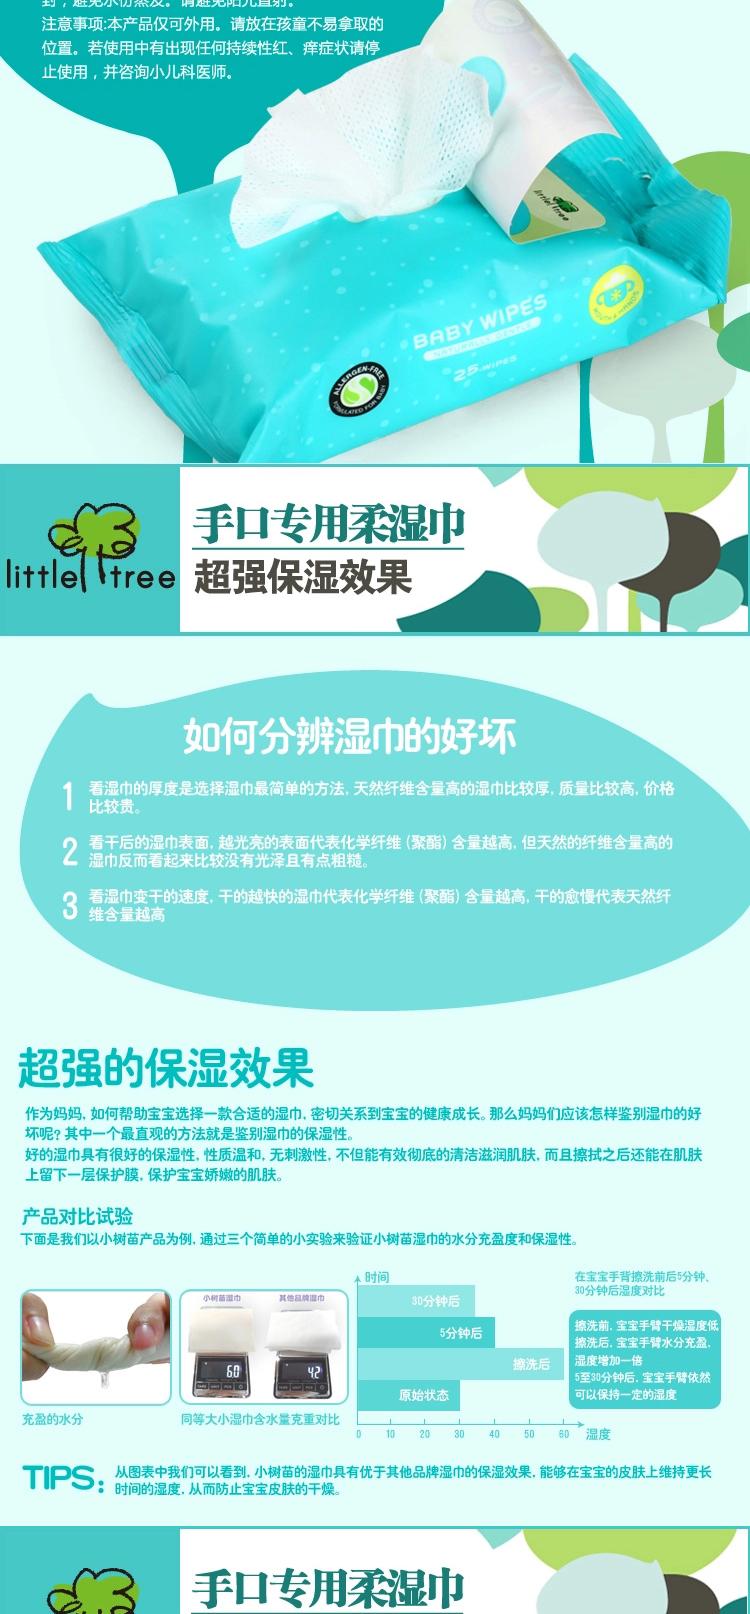 little tree小树苗 手口专用婴儿柔湿巾 25片【价格